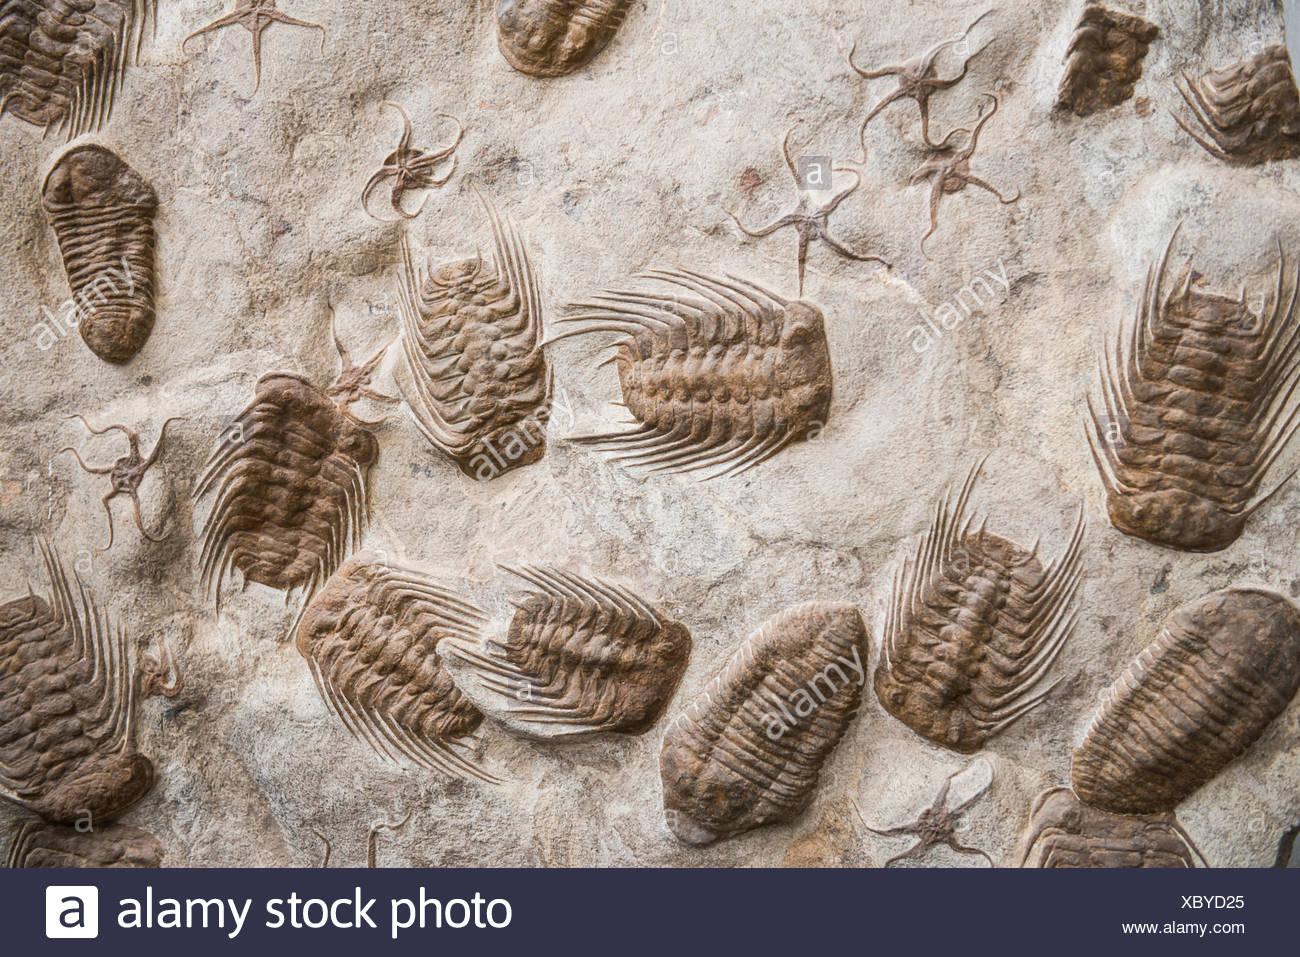 Trilobita, fossil trilobites, found near Rissani, Morocco - Stock Image